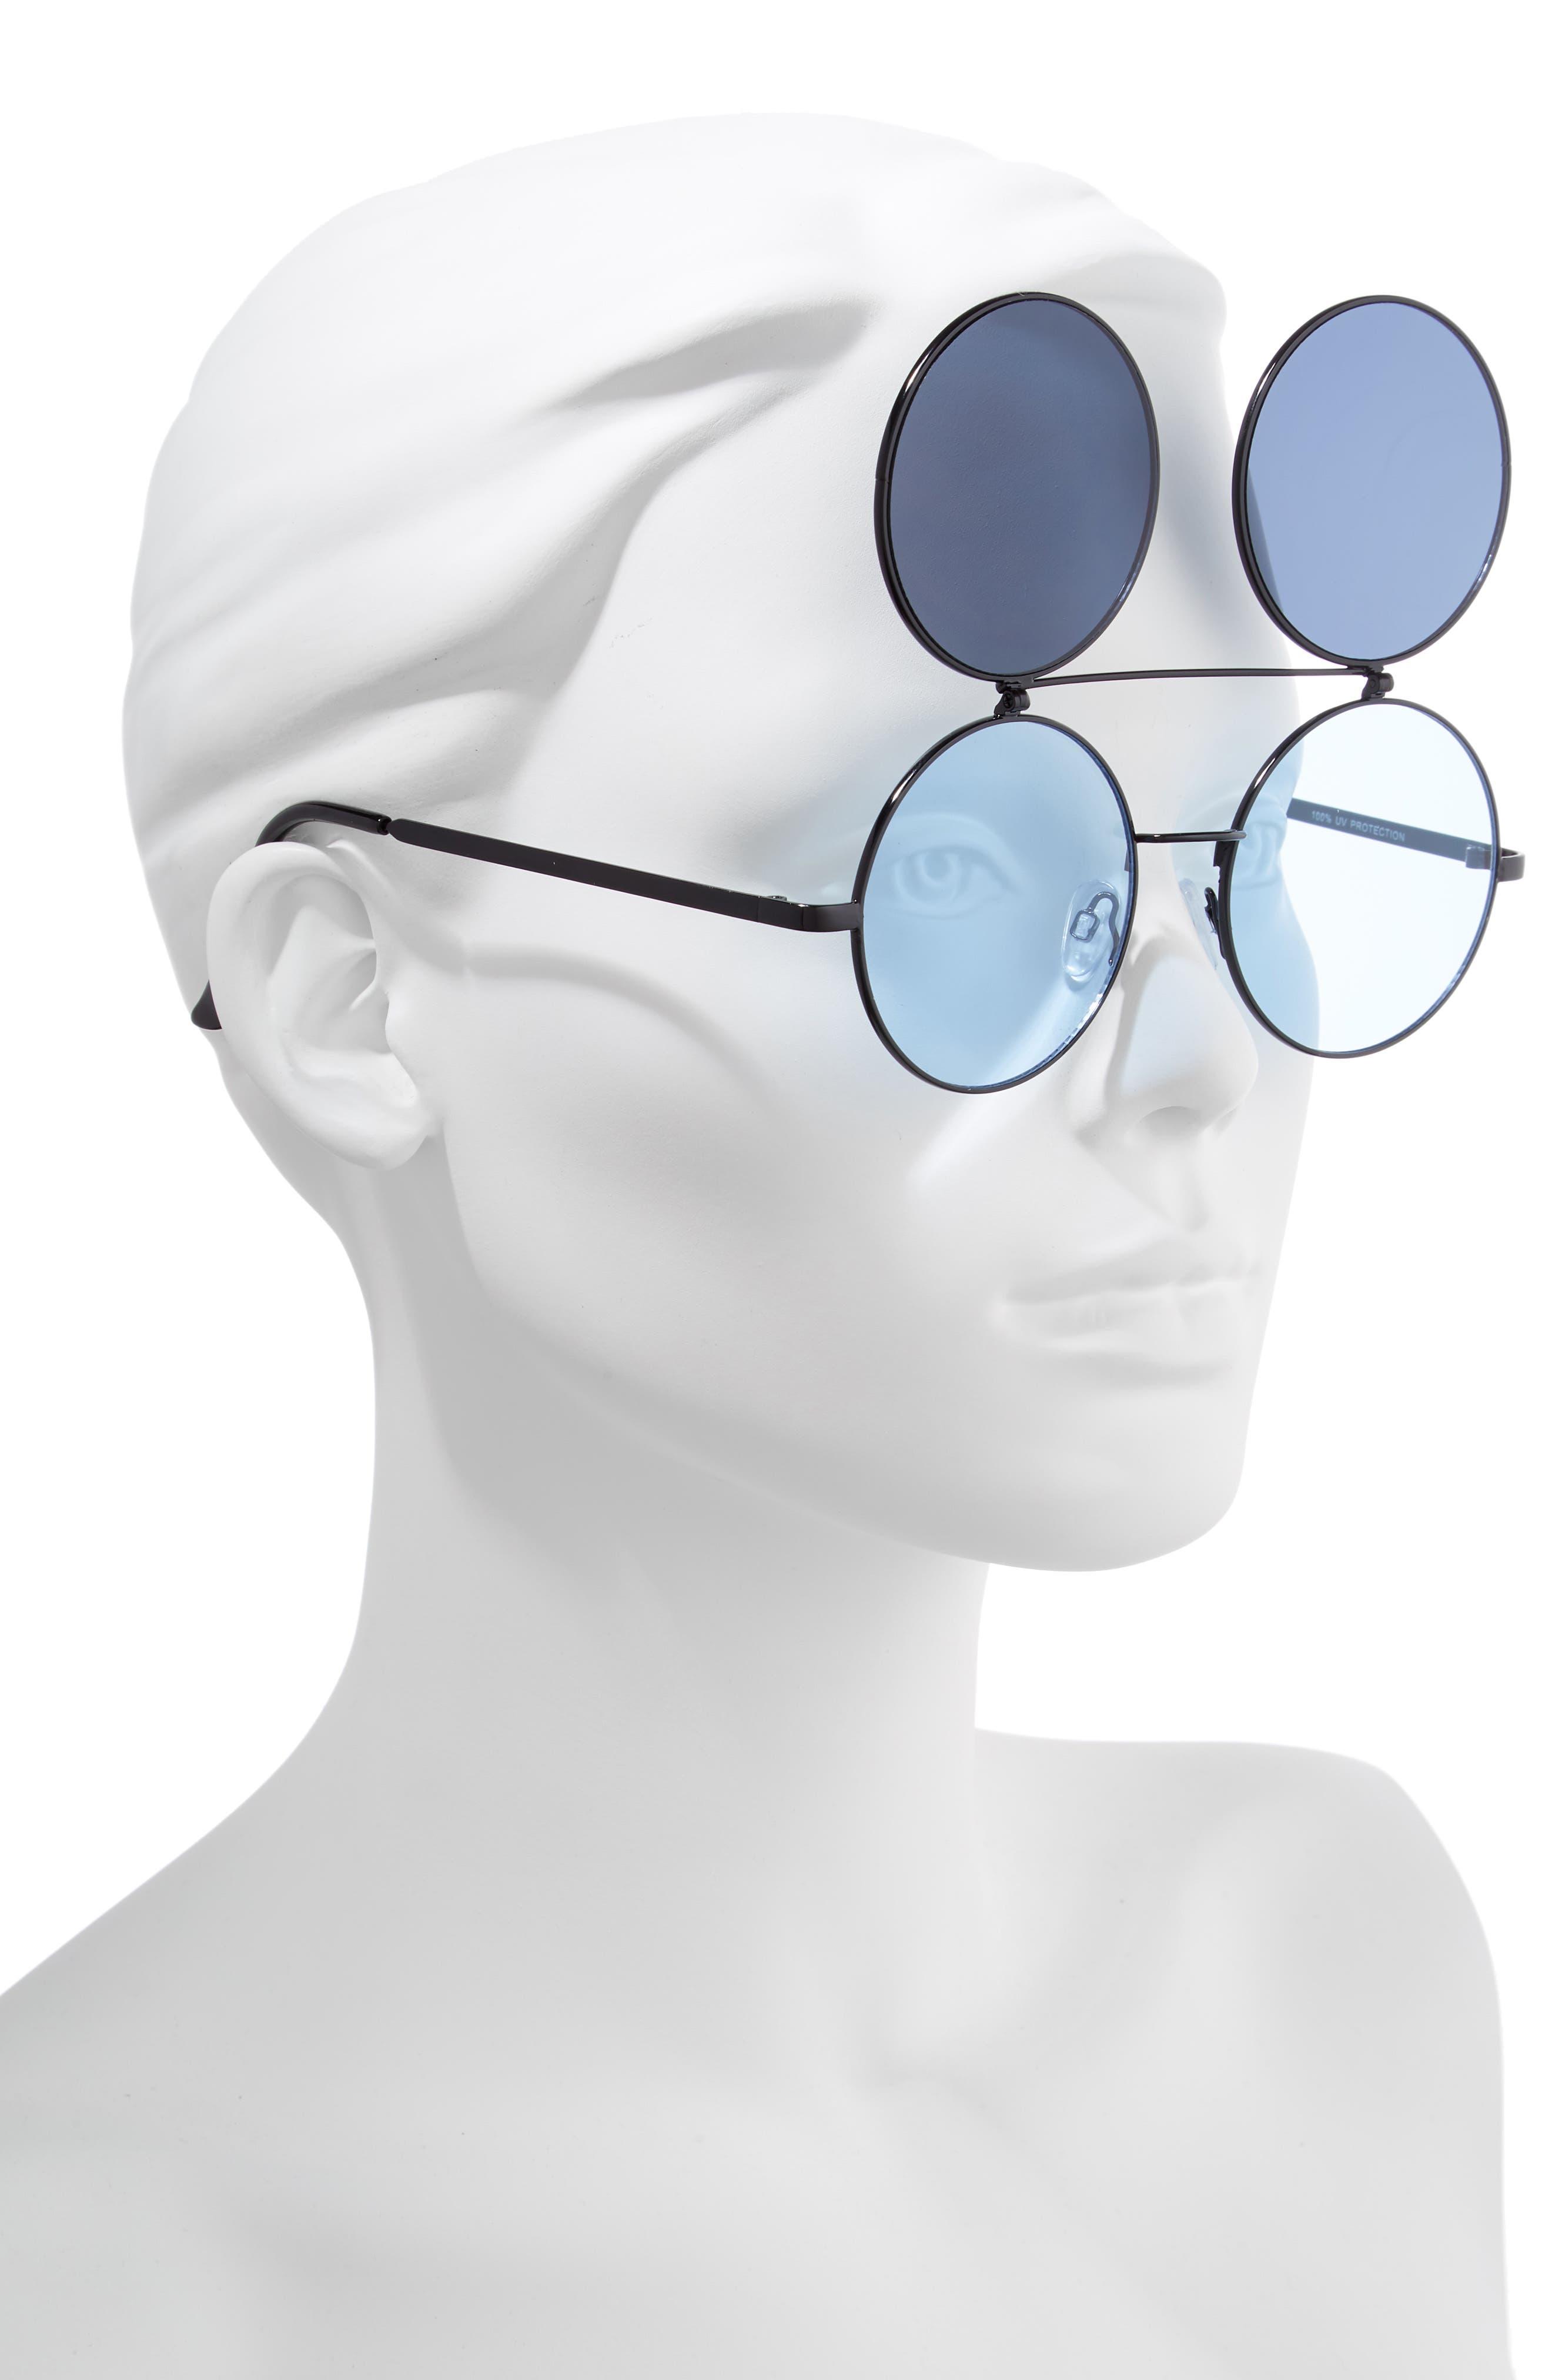 50mm Round Flip-Up Sunglasses,                             Alternate thumbnail 2, color,                             BLACK/ BLUE